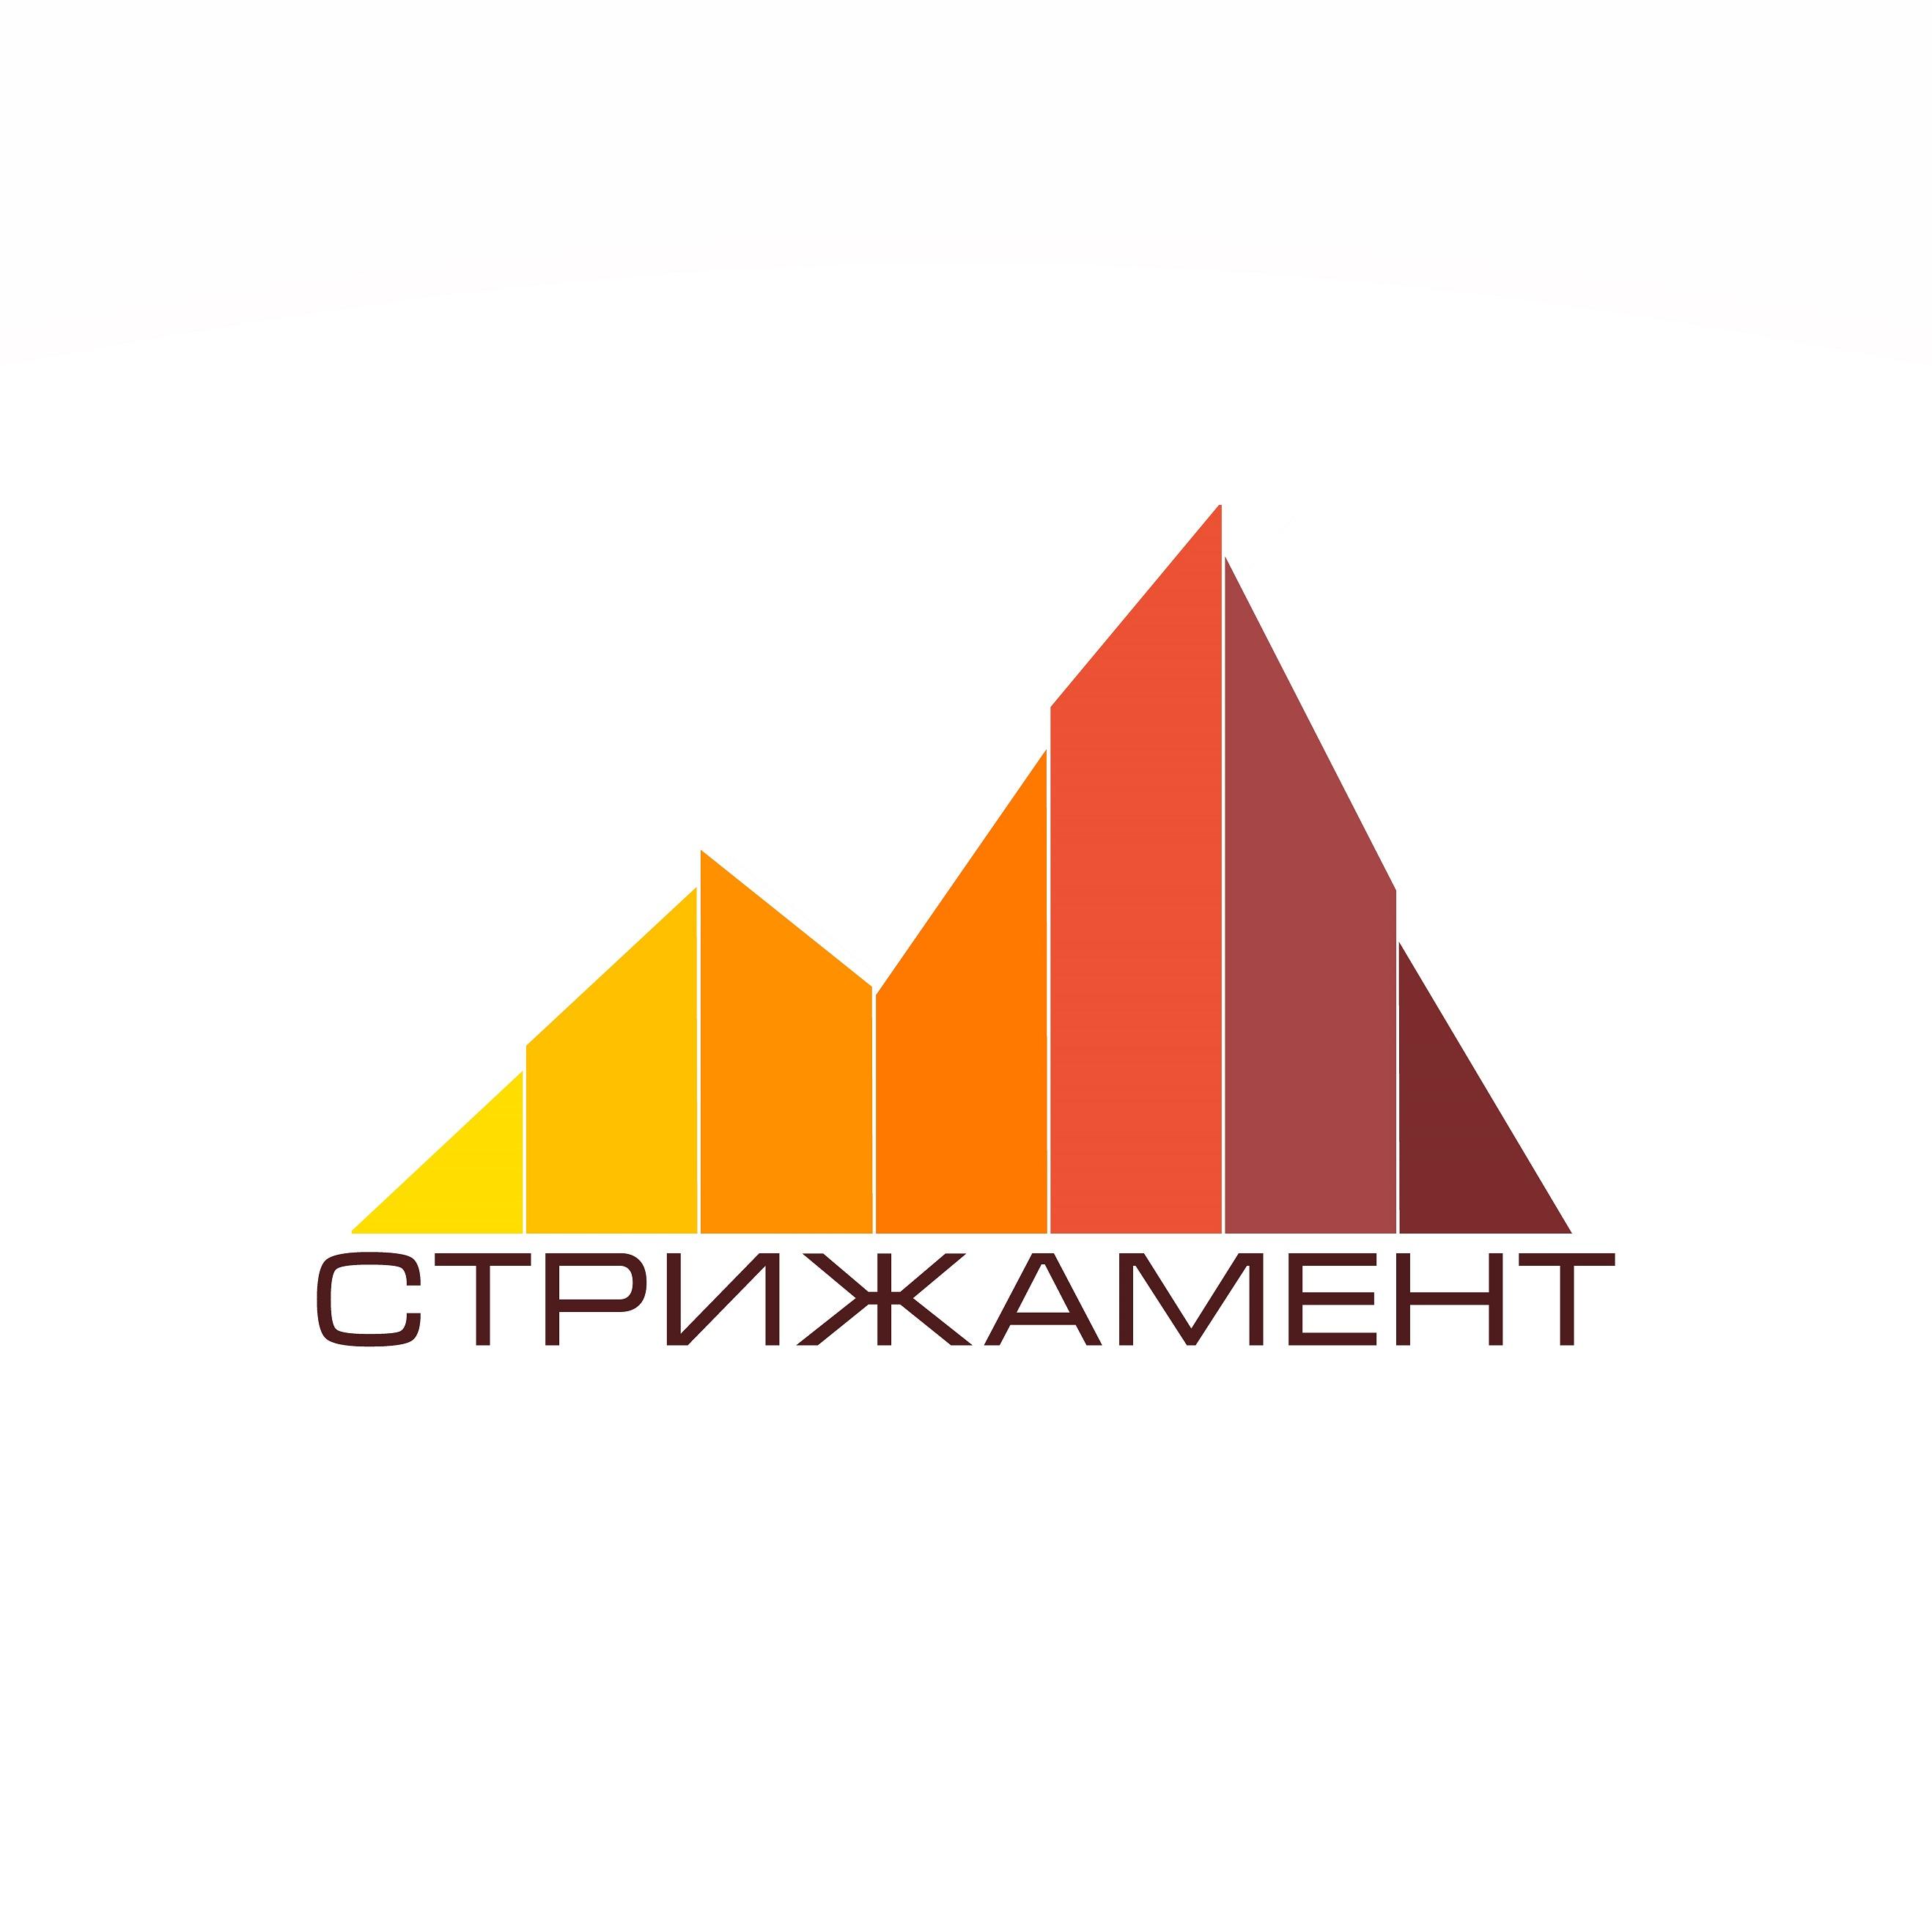 Дизайн лого бренда фото f_7055d5016bcd8500.jpg